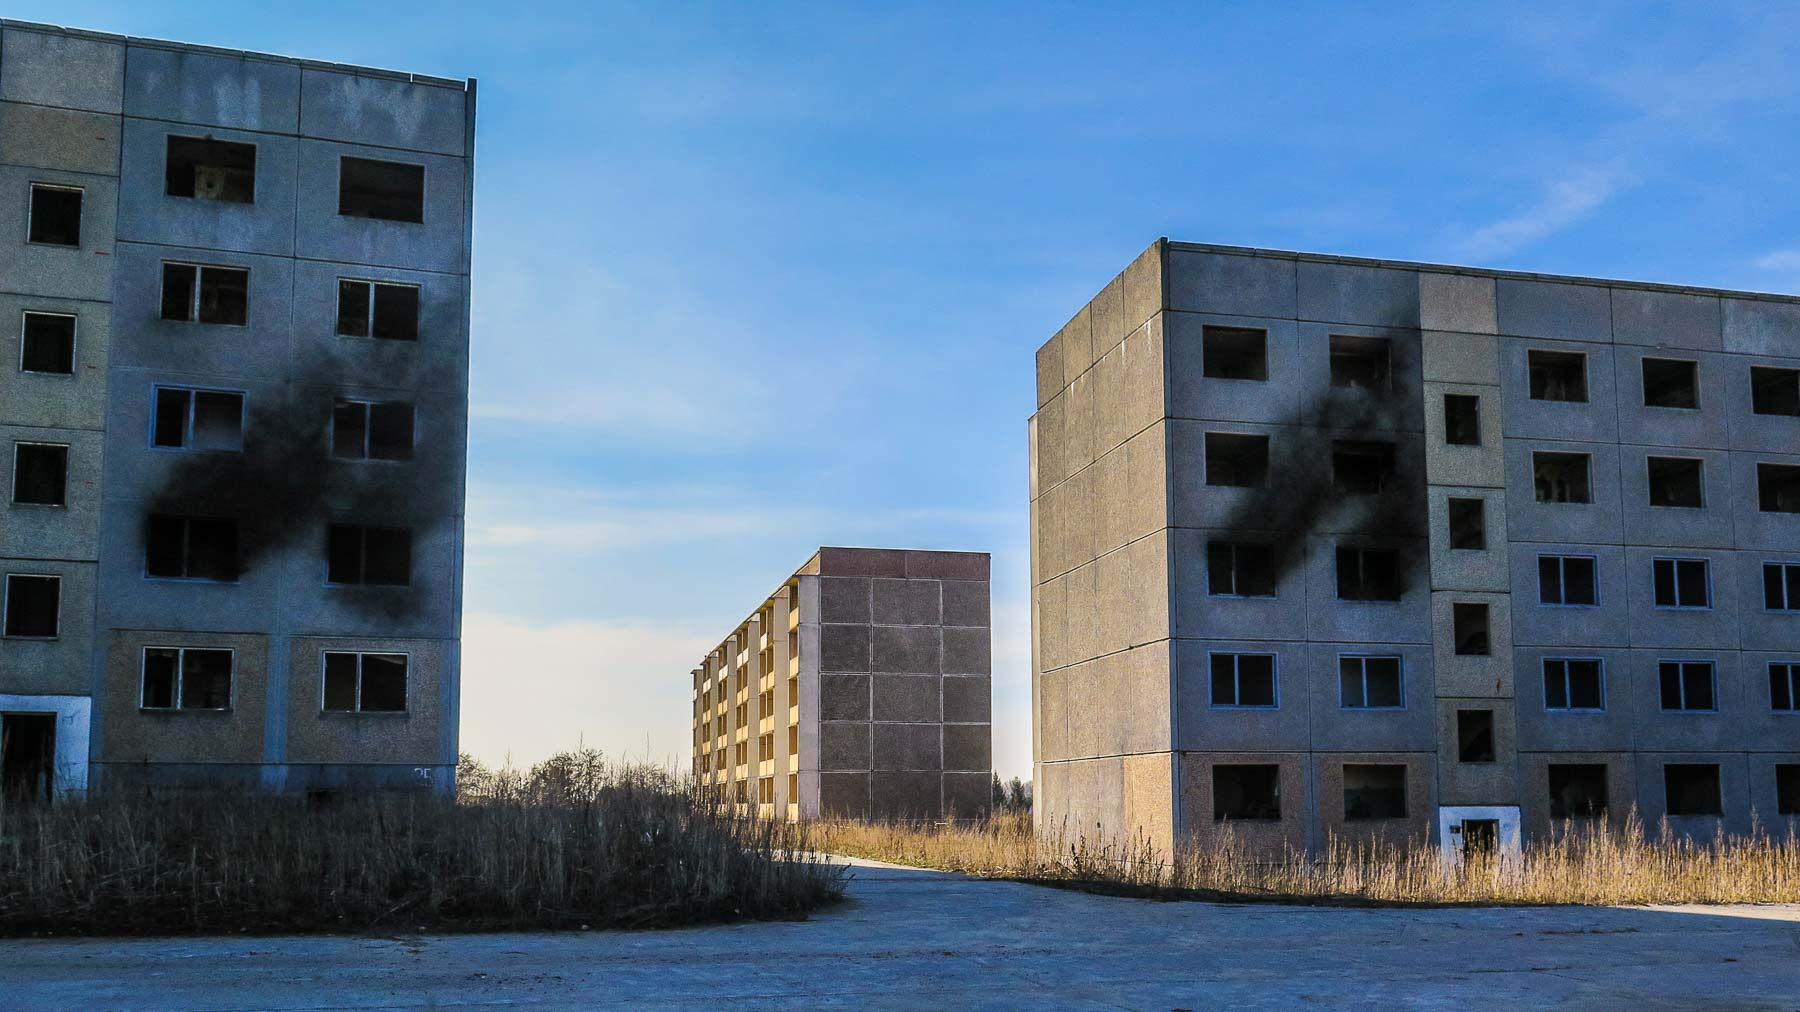 Neubaugebiet Lost Places Sowjetische Kaserne